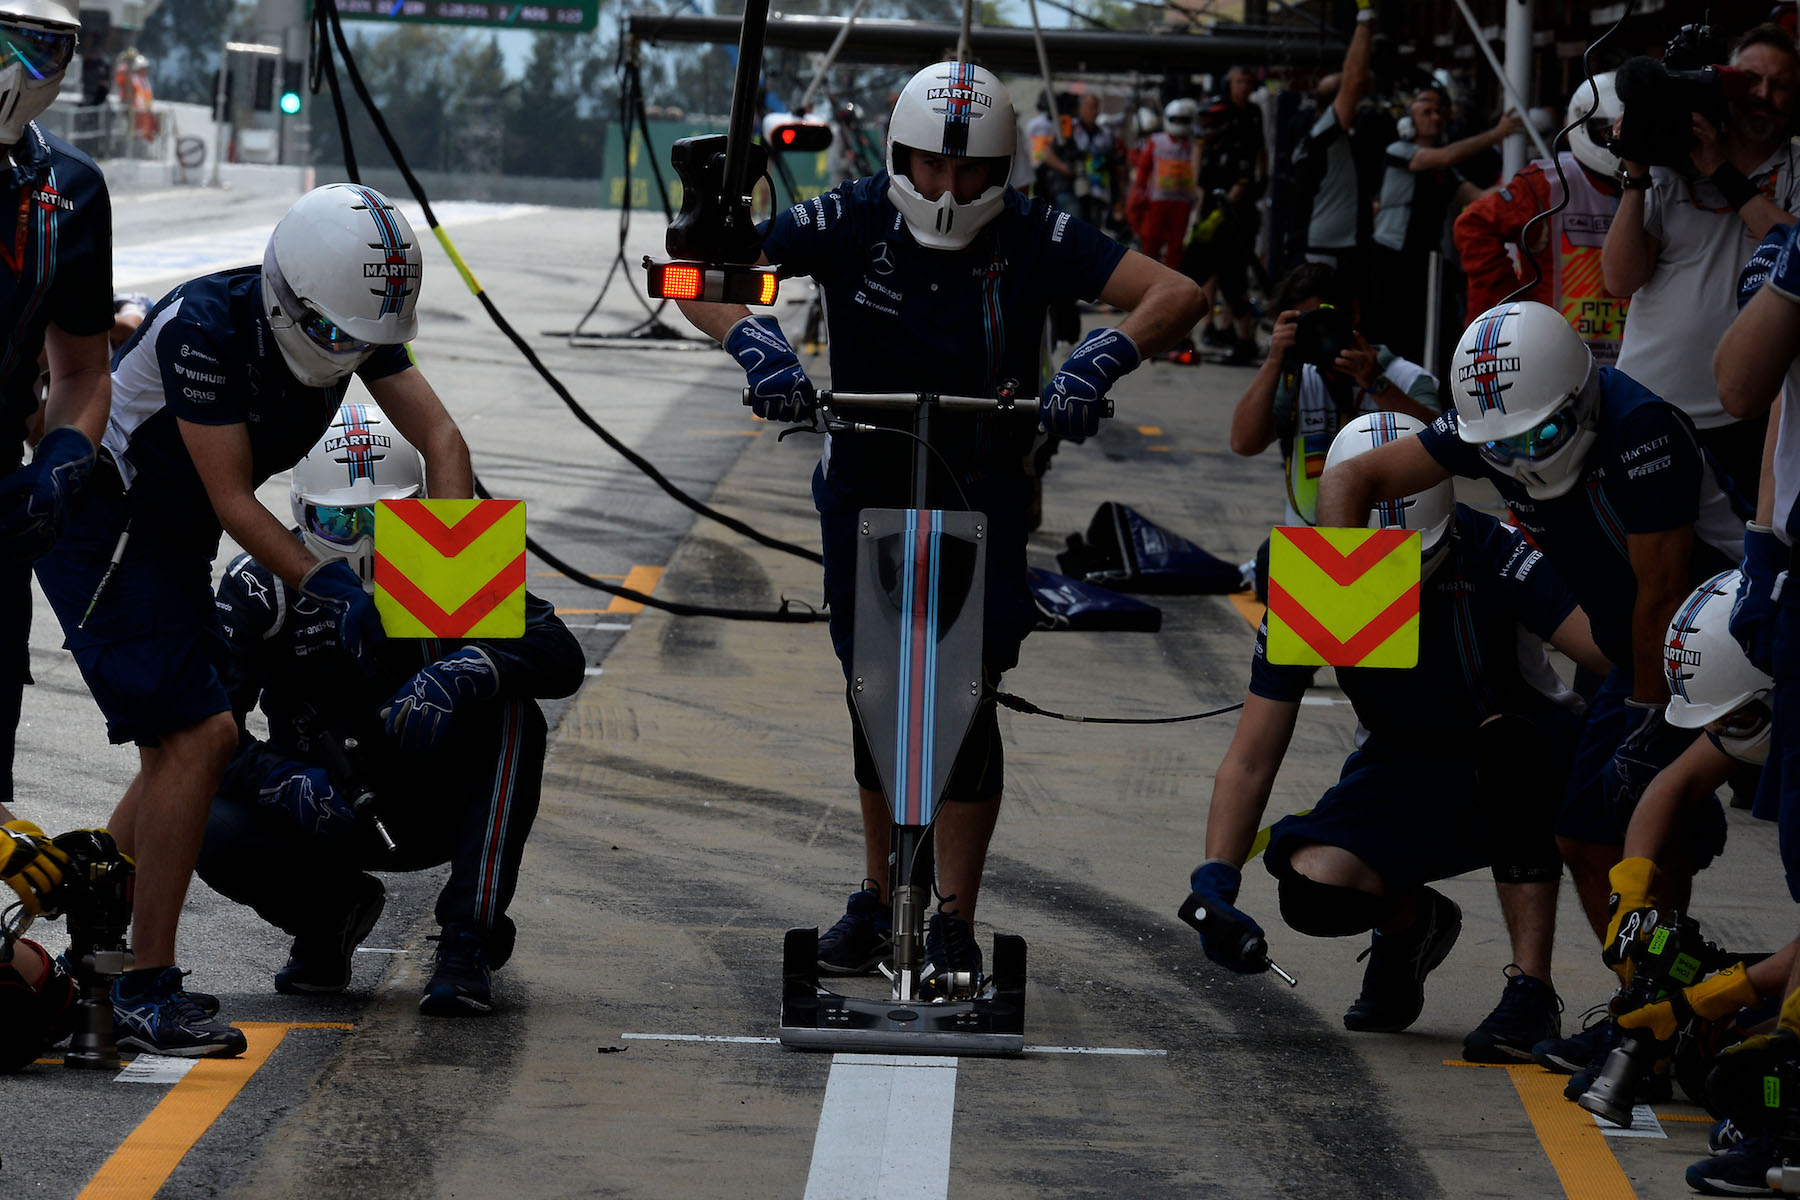 Salracing   Williams F1 Team Mechanics